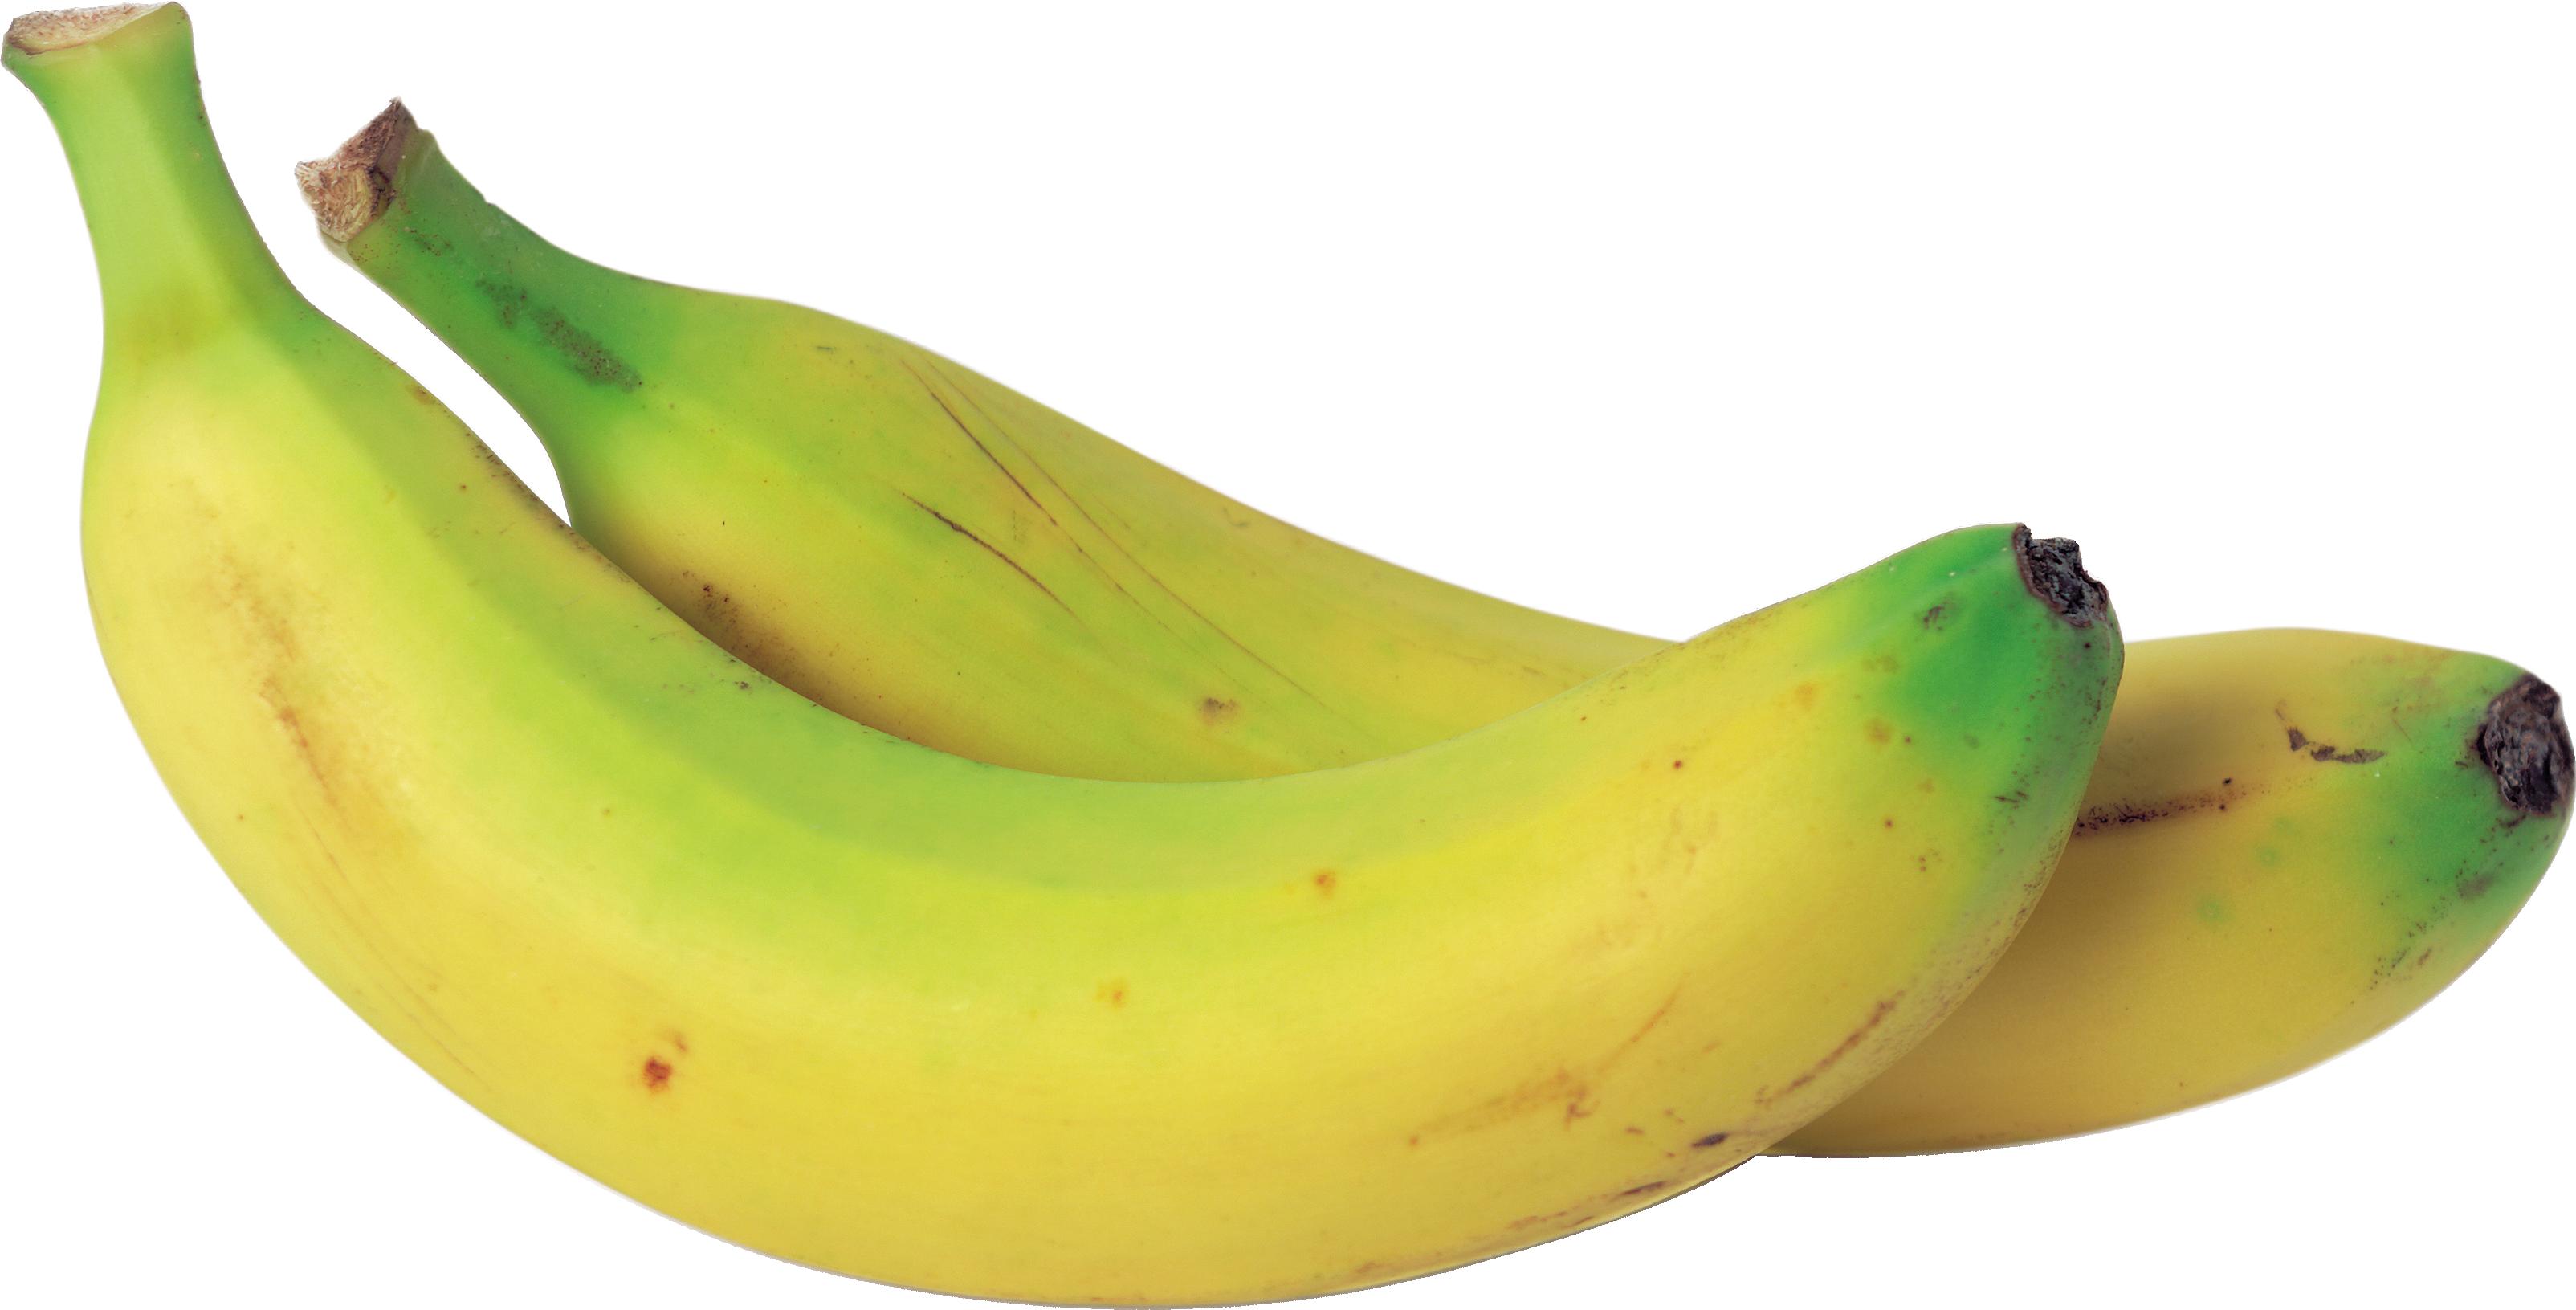 Light Green Banana